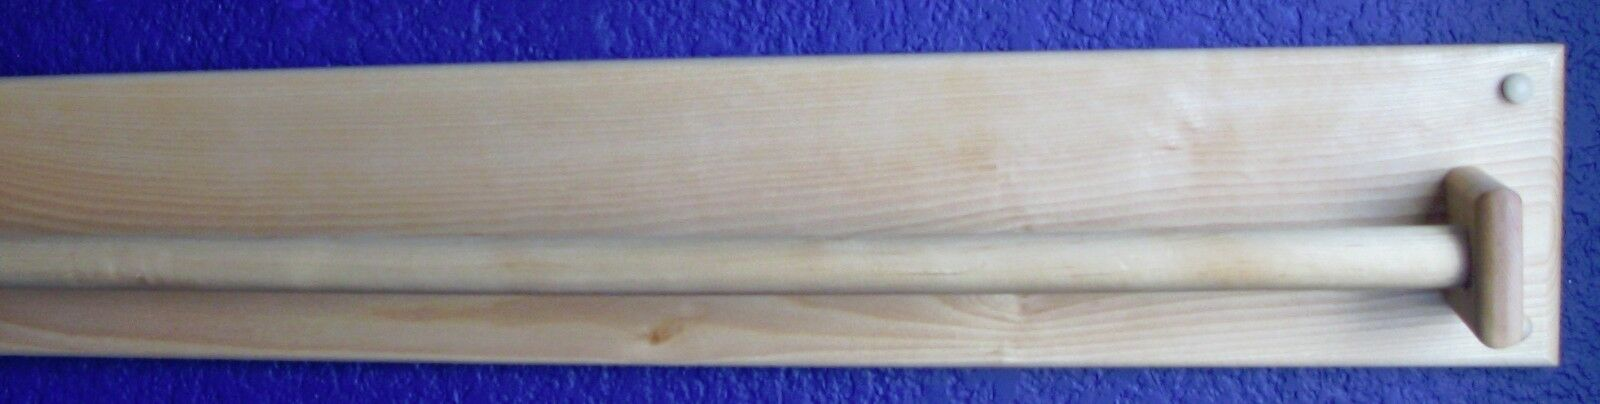 Towel Bar 36  Solid Birch Birch Birch Wood Scandinavian Style b90793